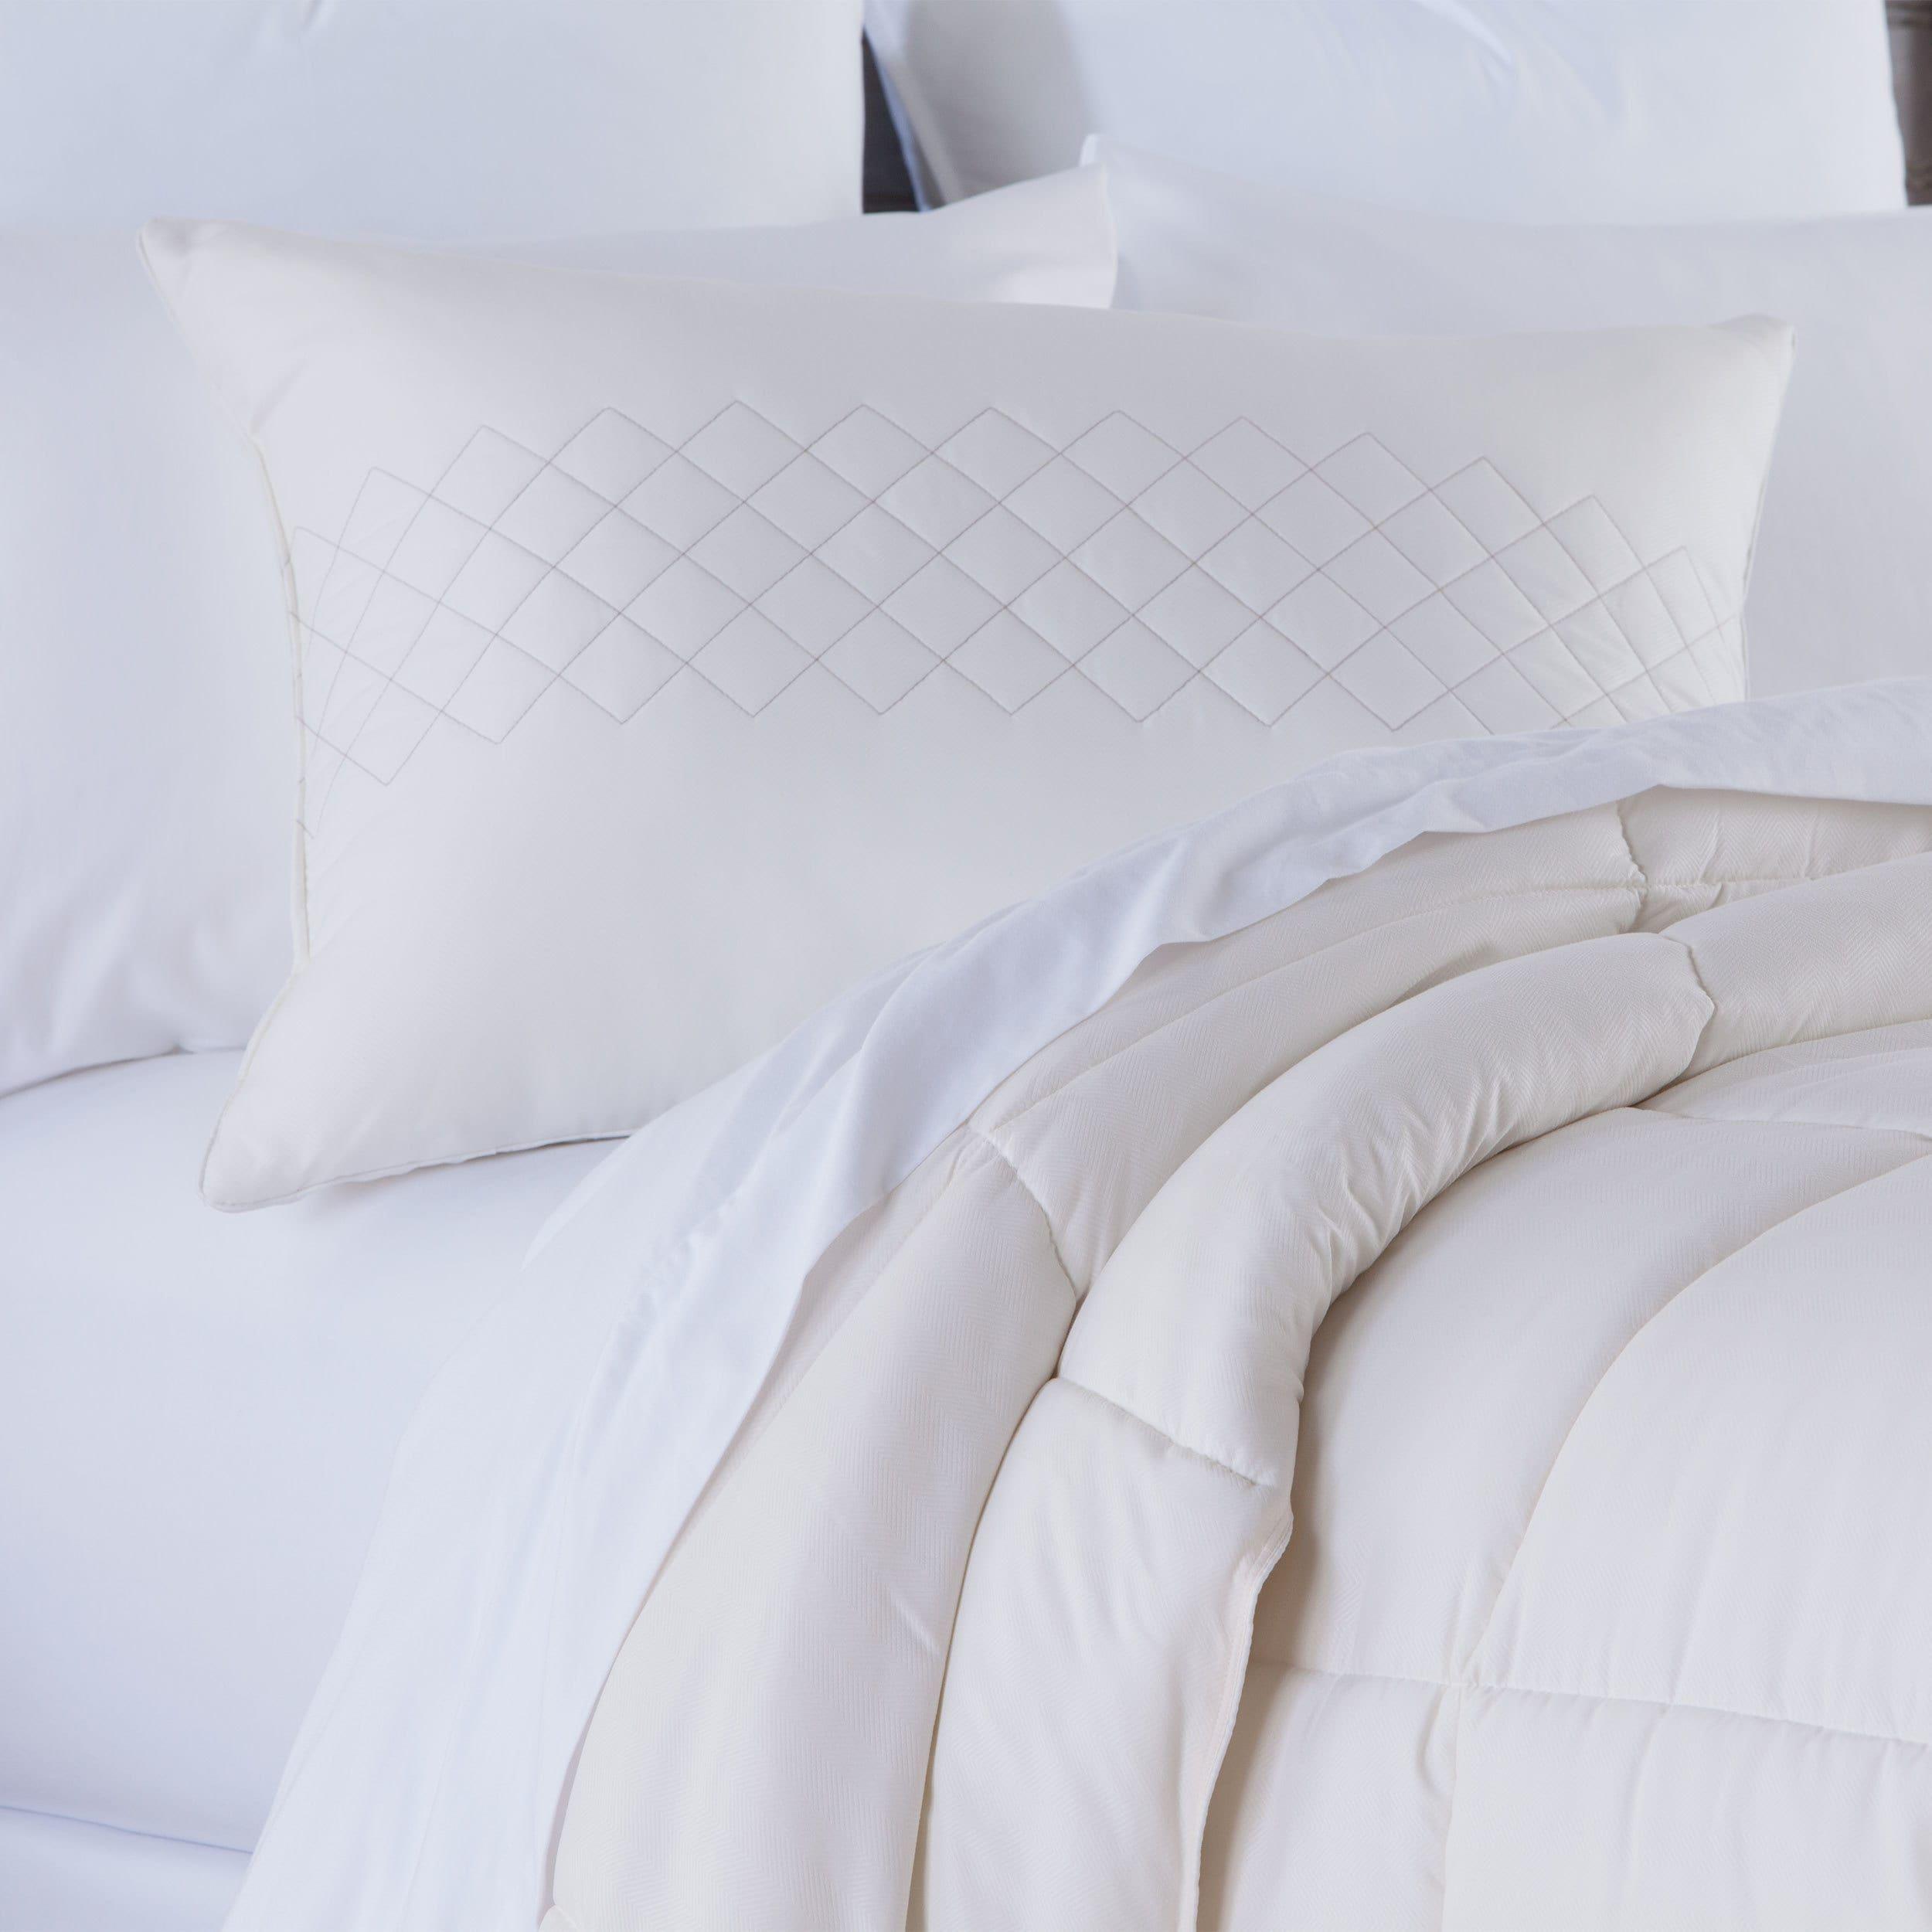 Tommy Bahama AquaLoft Hypoallergenic Squishy Gel Pillow